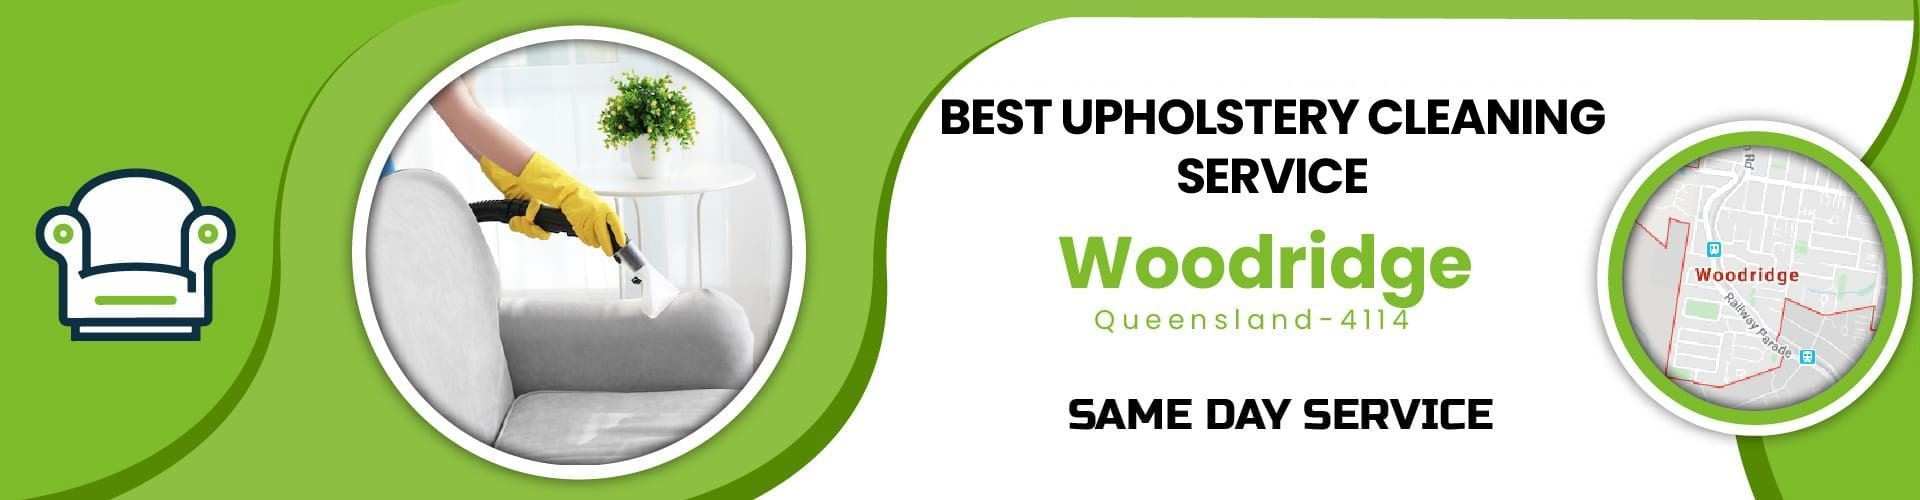 Upholstery Cleaning Woodridge